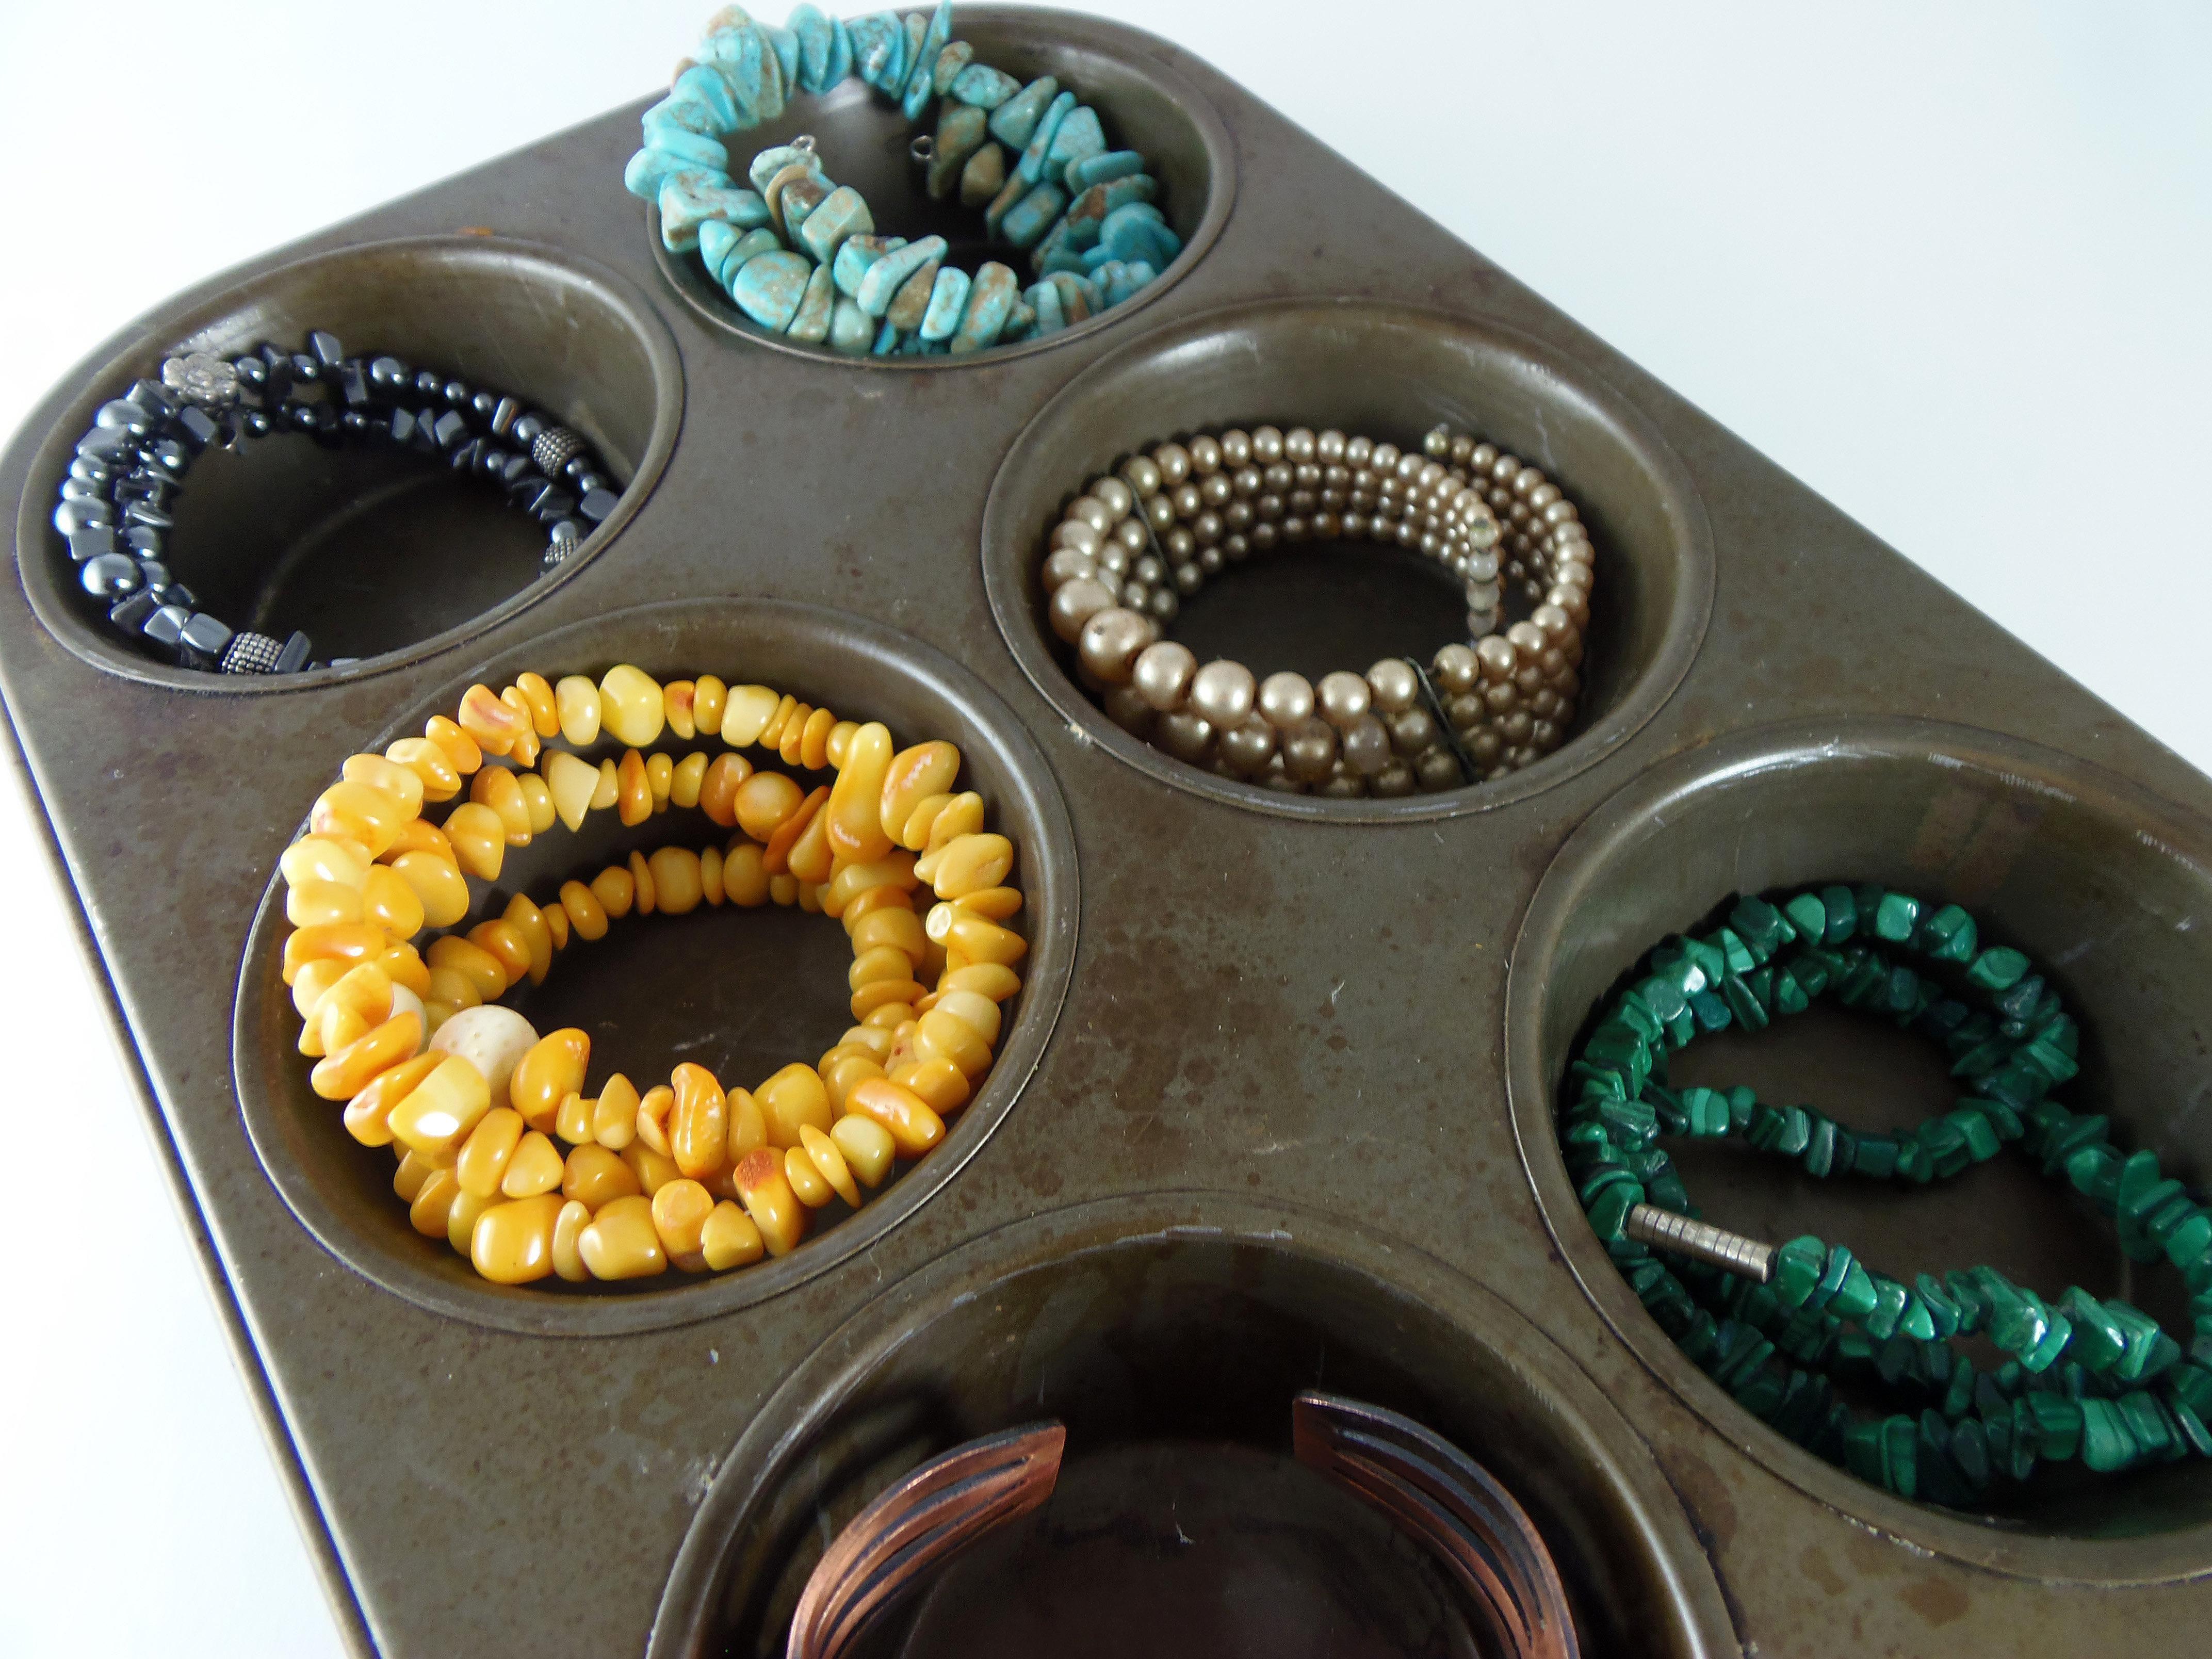 Jewelry stored in muffin tin